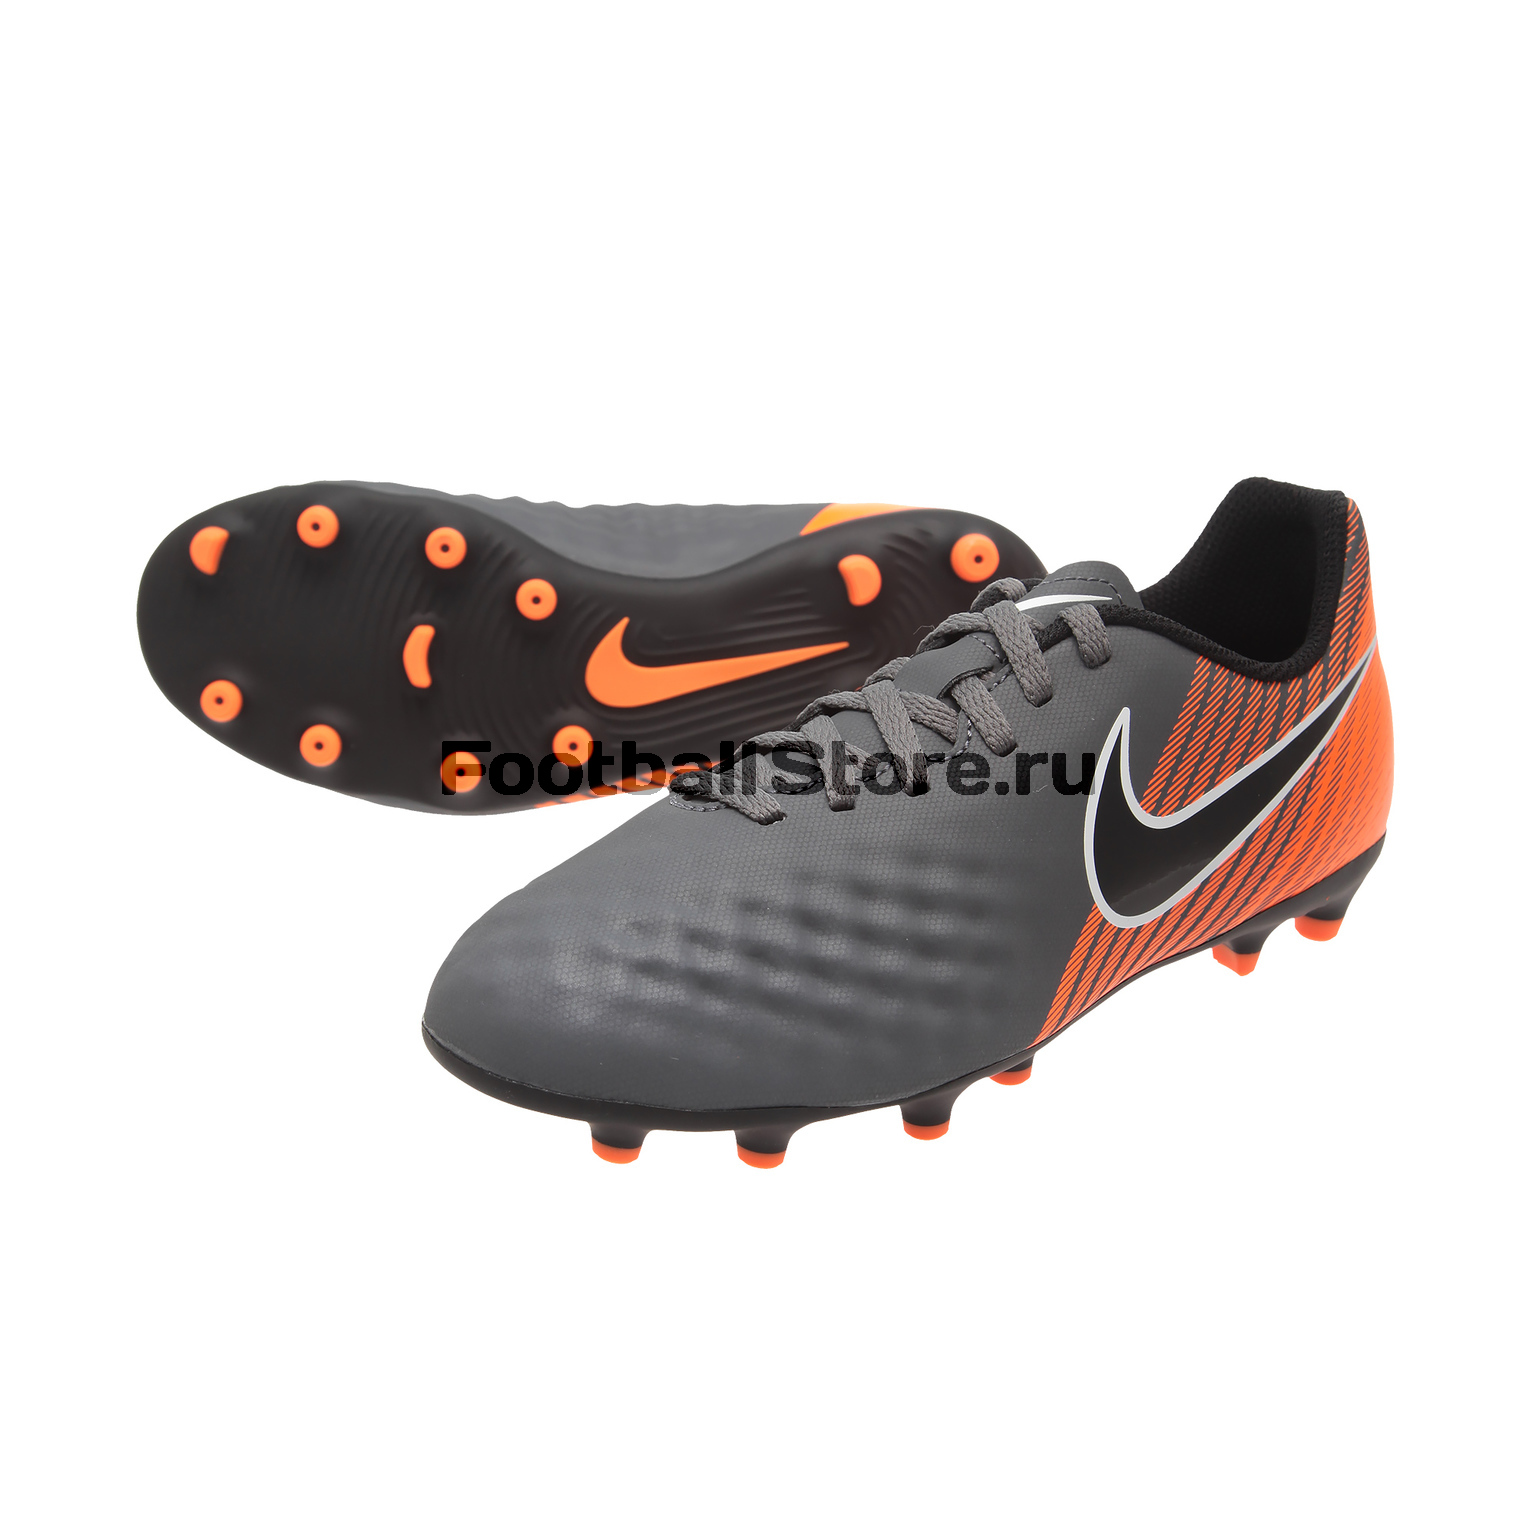 Бутсы детские Nike Obra 2 Club FG AH7314-080 бутсы nike jr obra 2 club fg ah7314 107